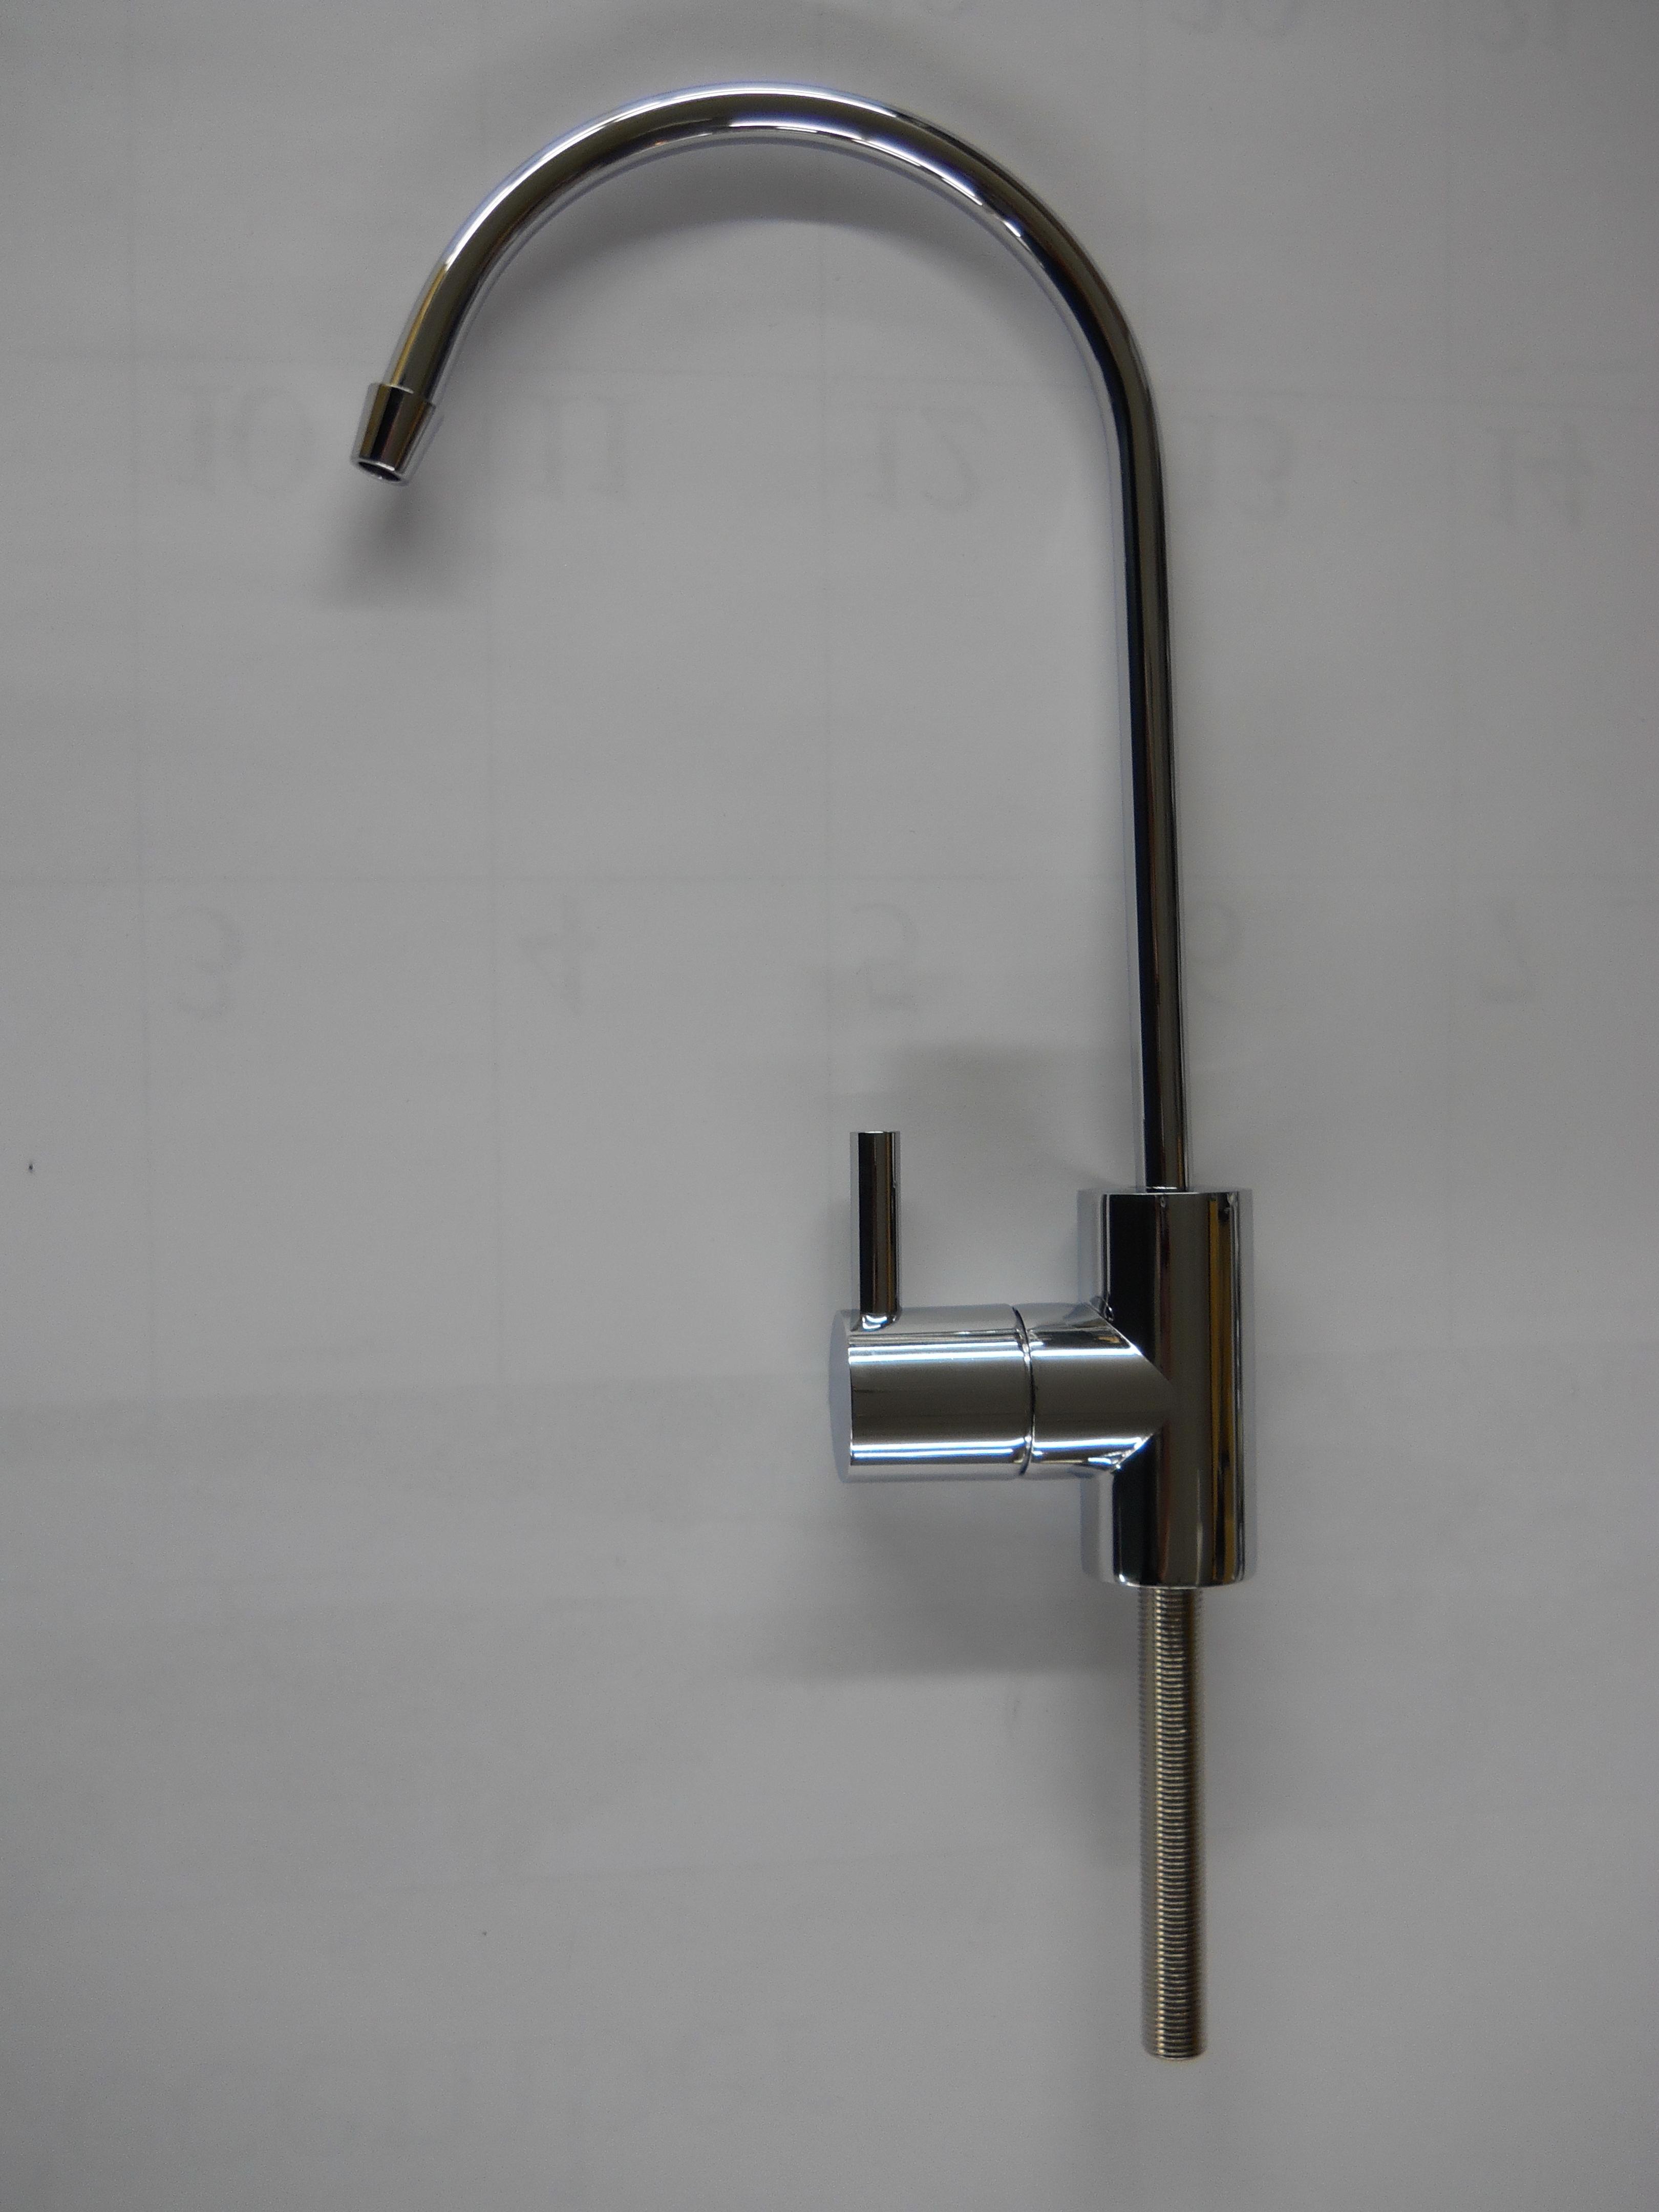 Faucet, Chrome Non Air Gap Contemporary Series Premium